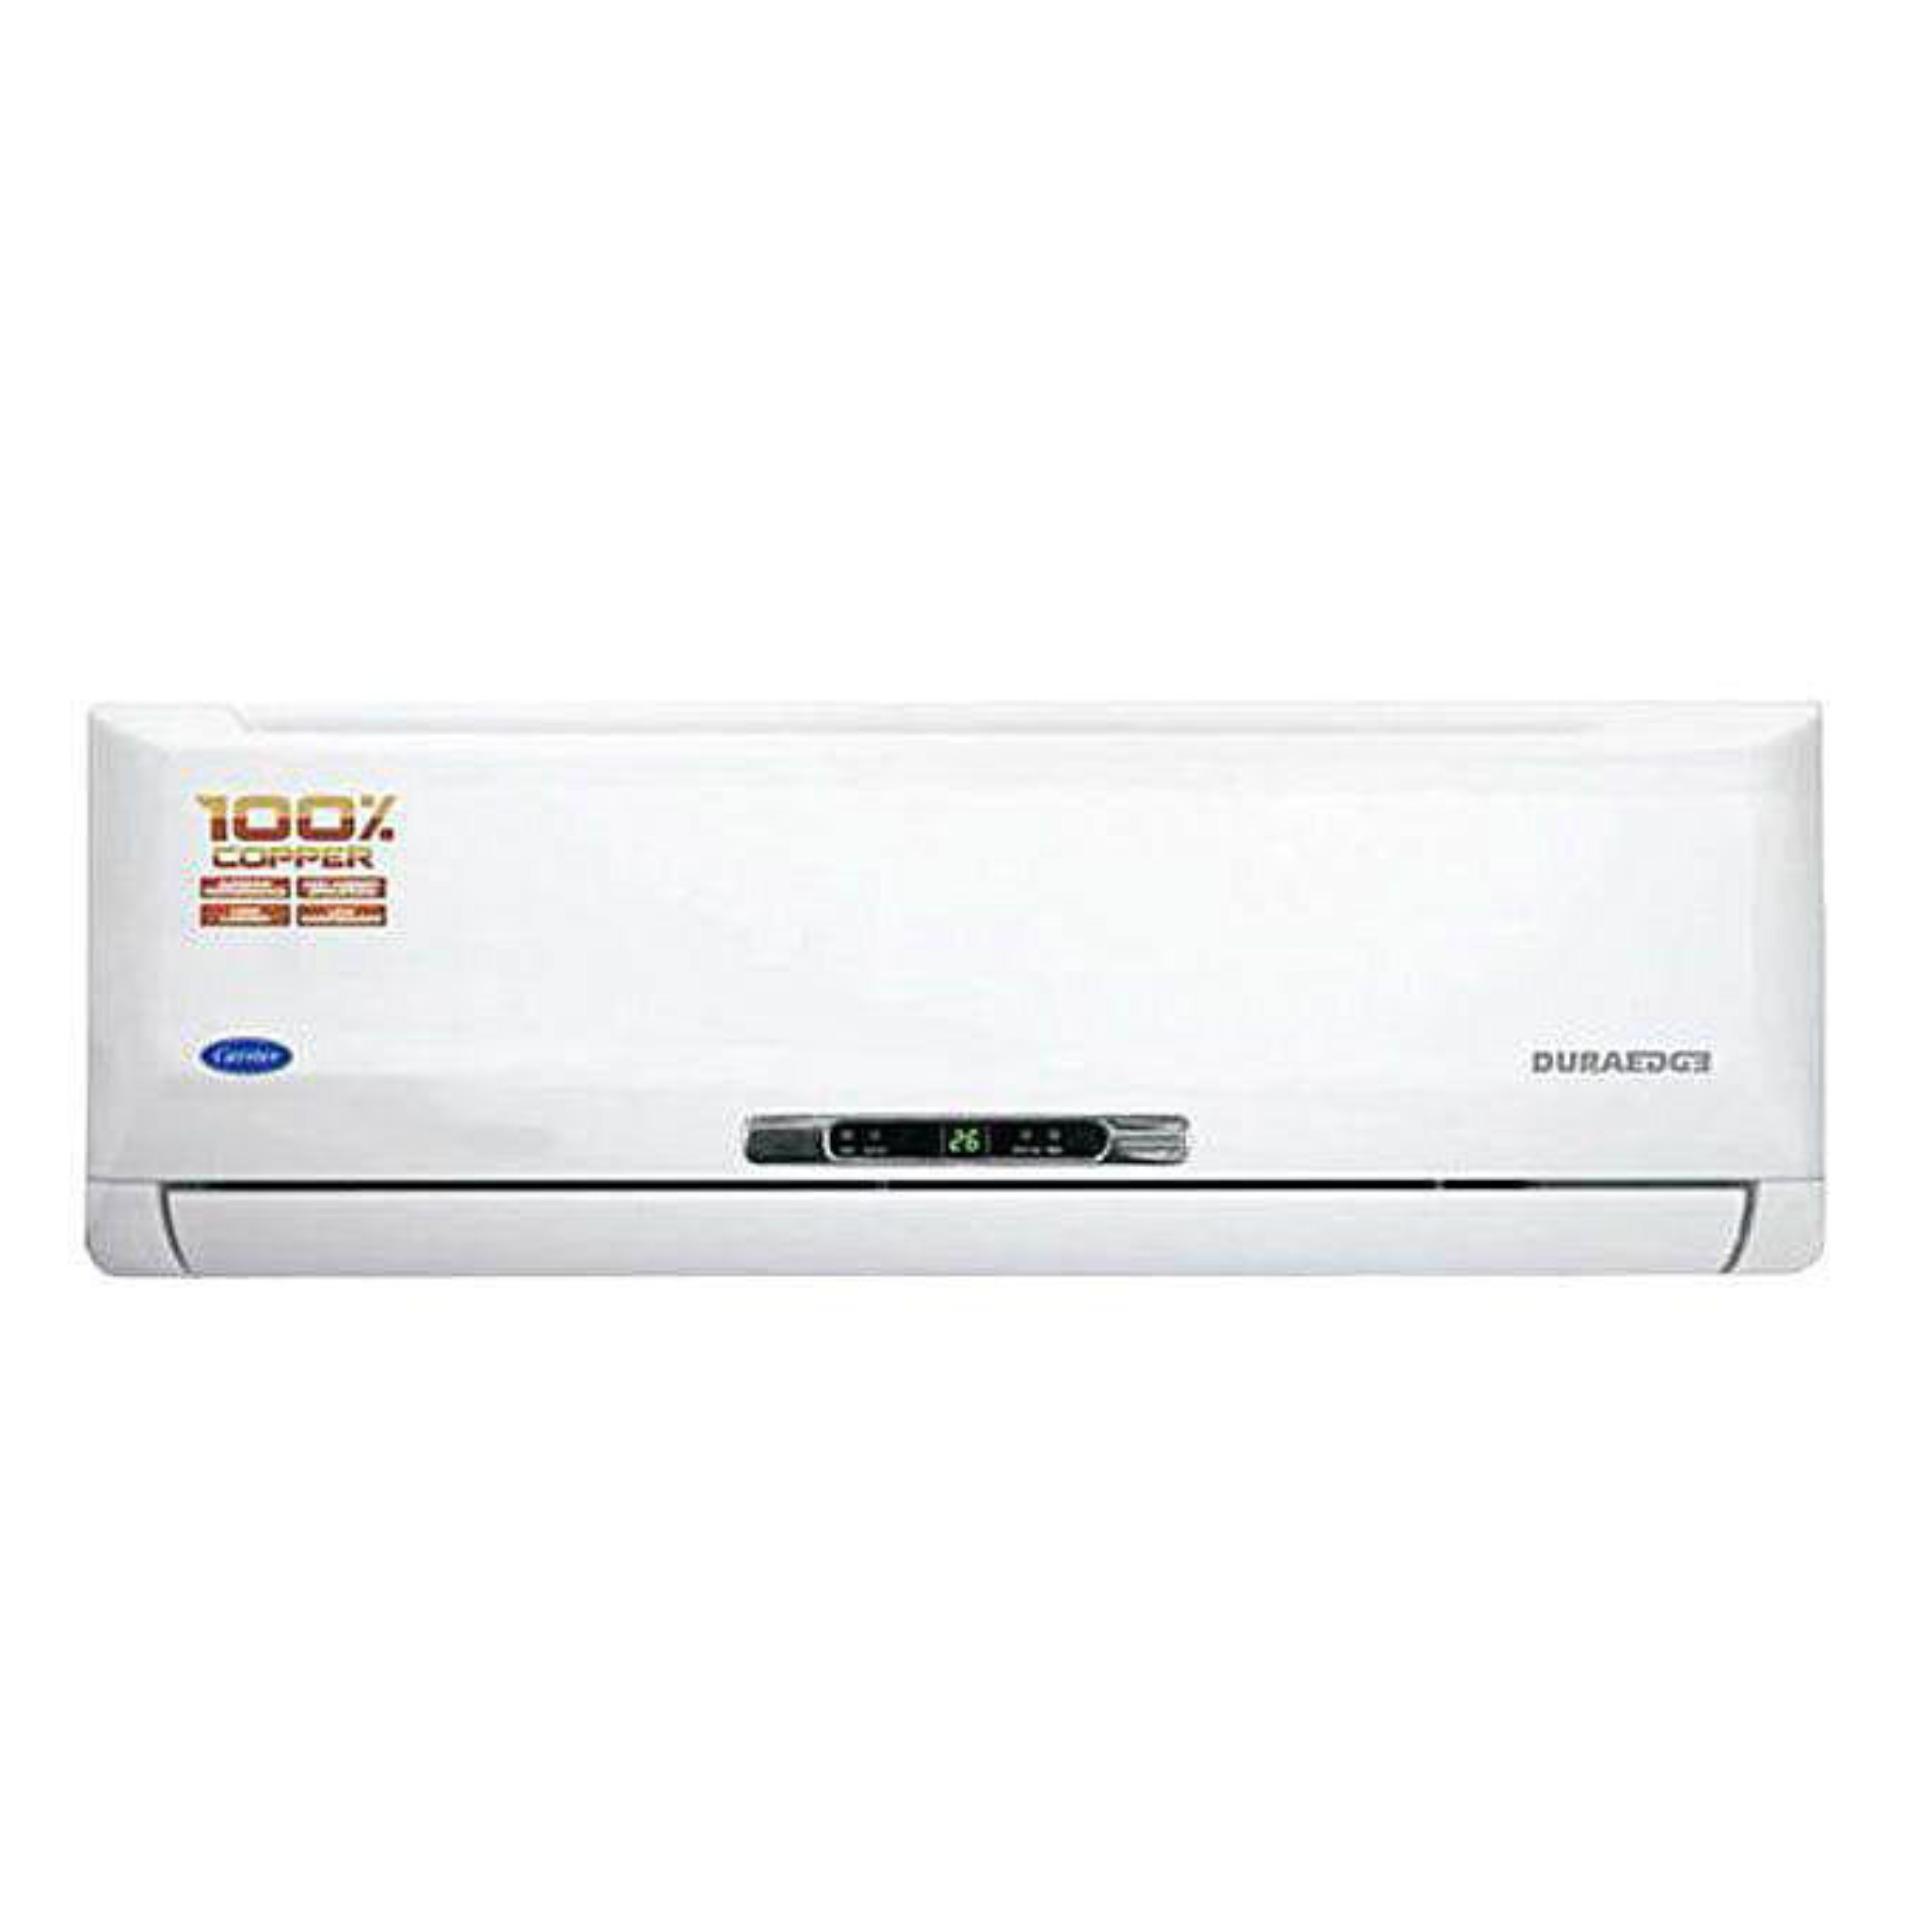 42KHAO18N Split AC - 1.5 Ton - White